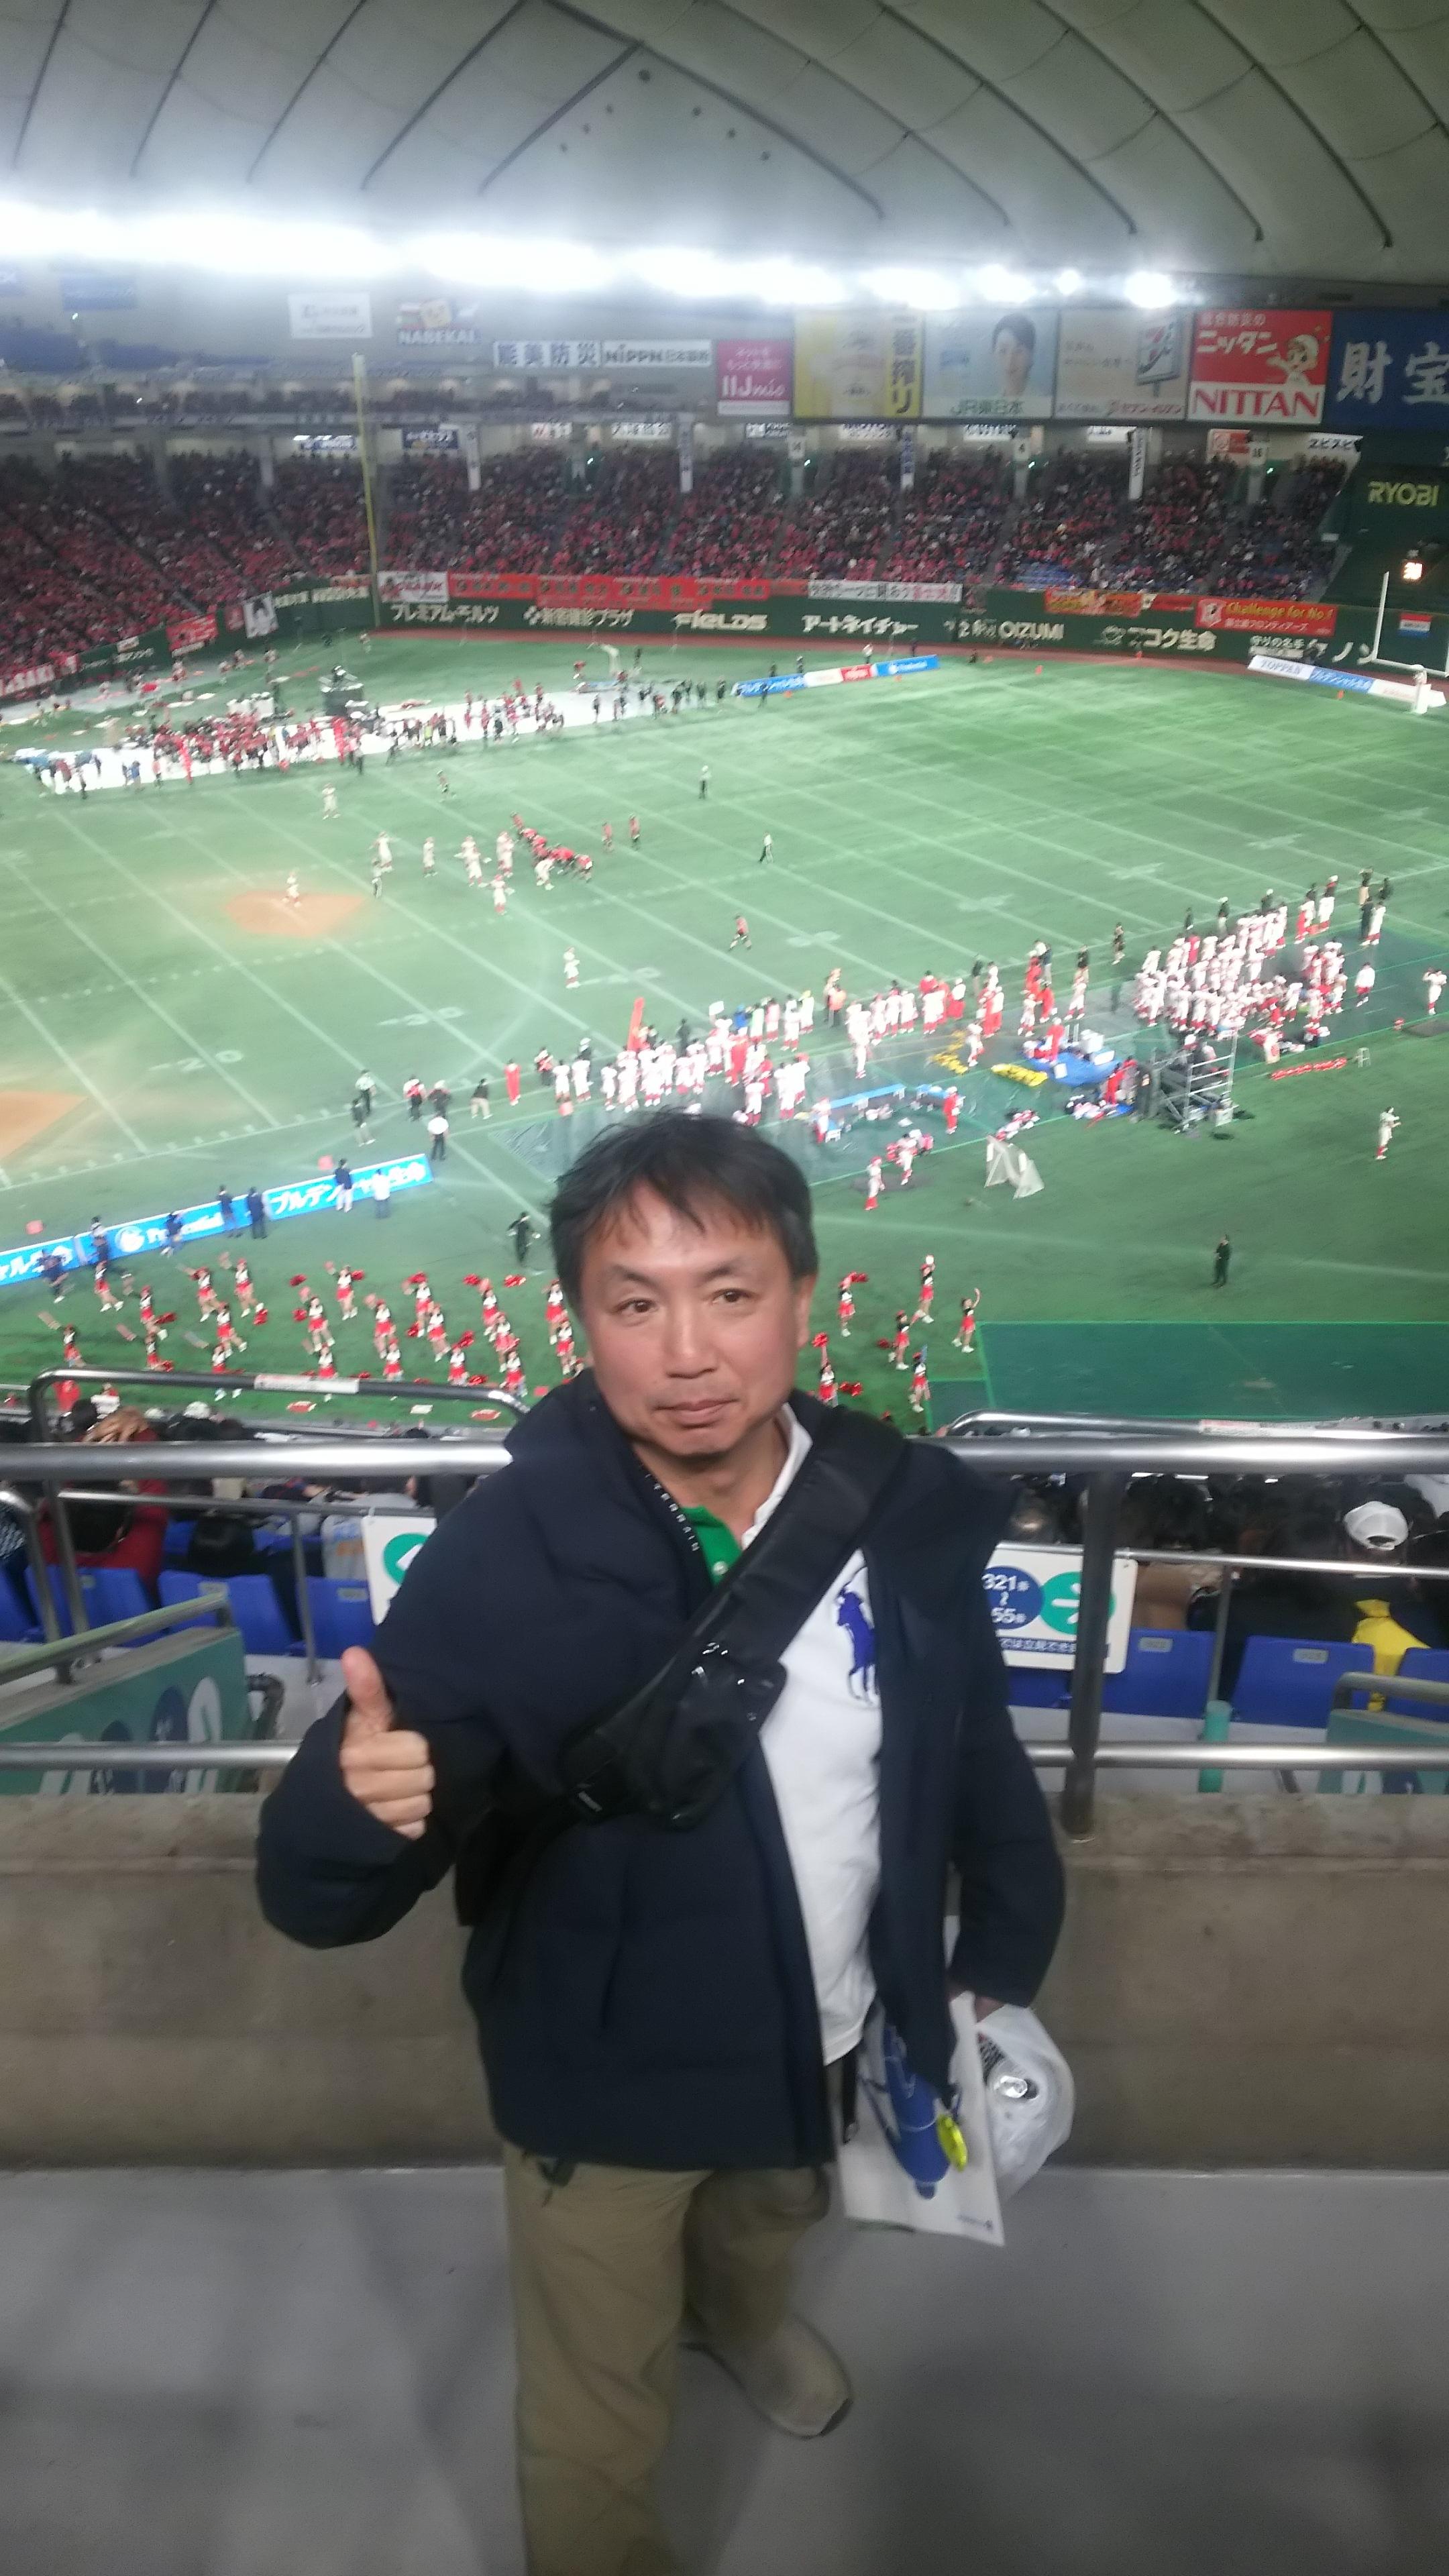 DSC_0419_20180103183509.jpg